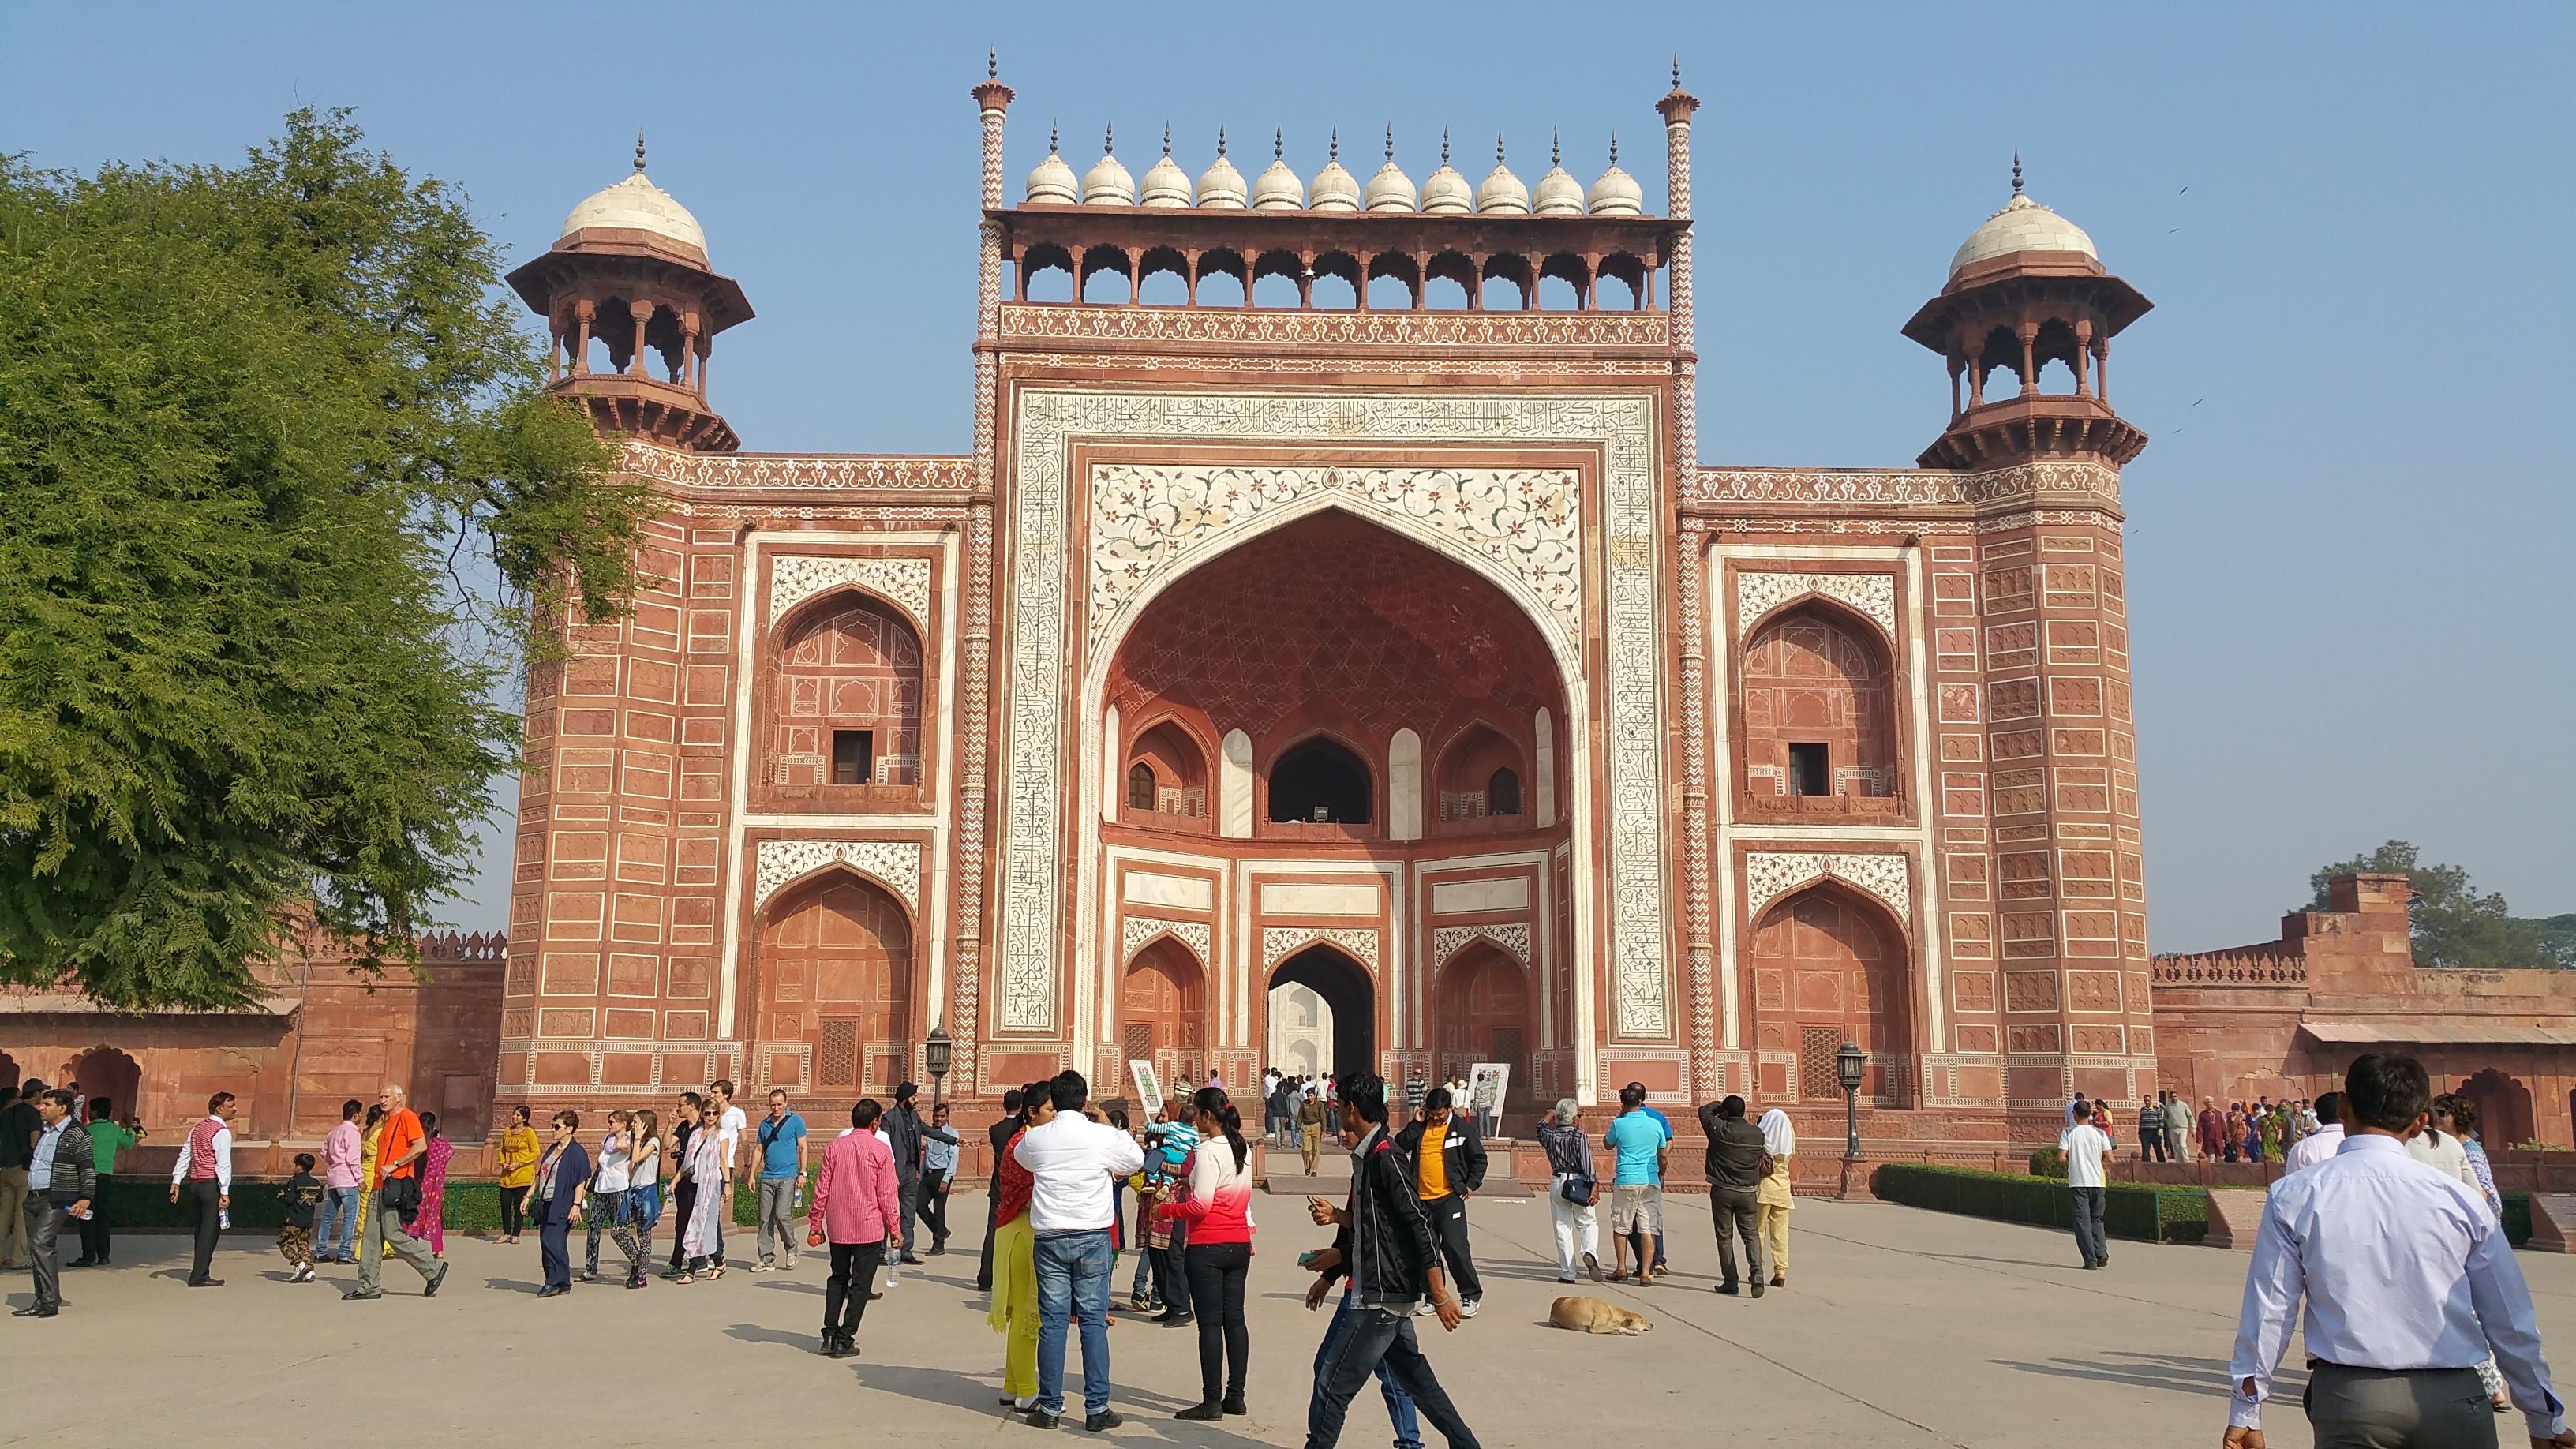 Entrance of the Taj Mahal, Agra, India.